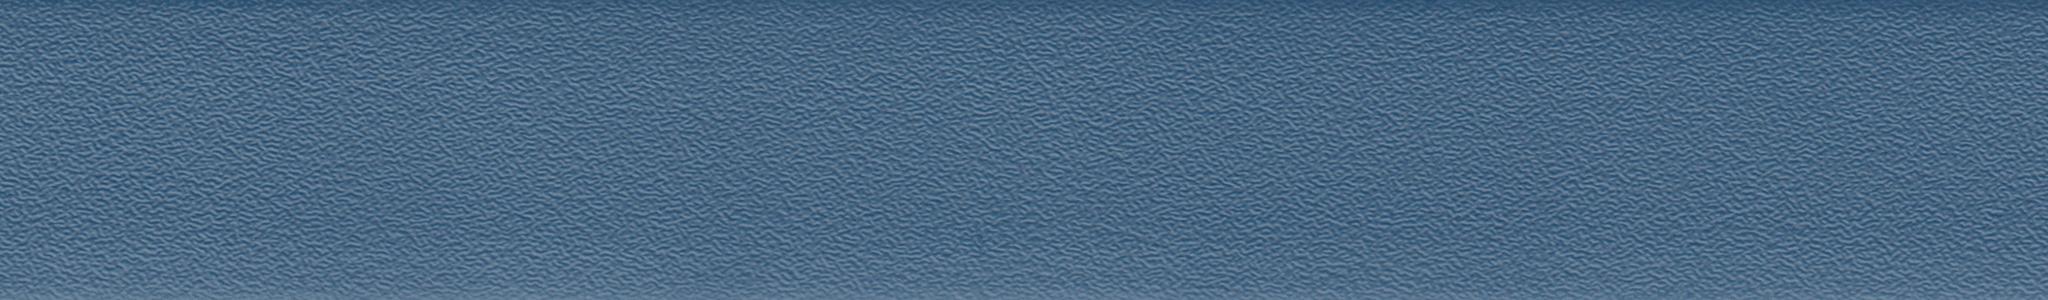 HU 151747 Chant ABS Bleu Foncé Perle 101